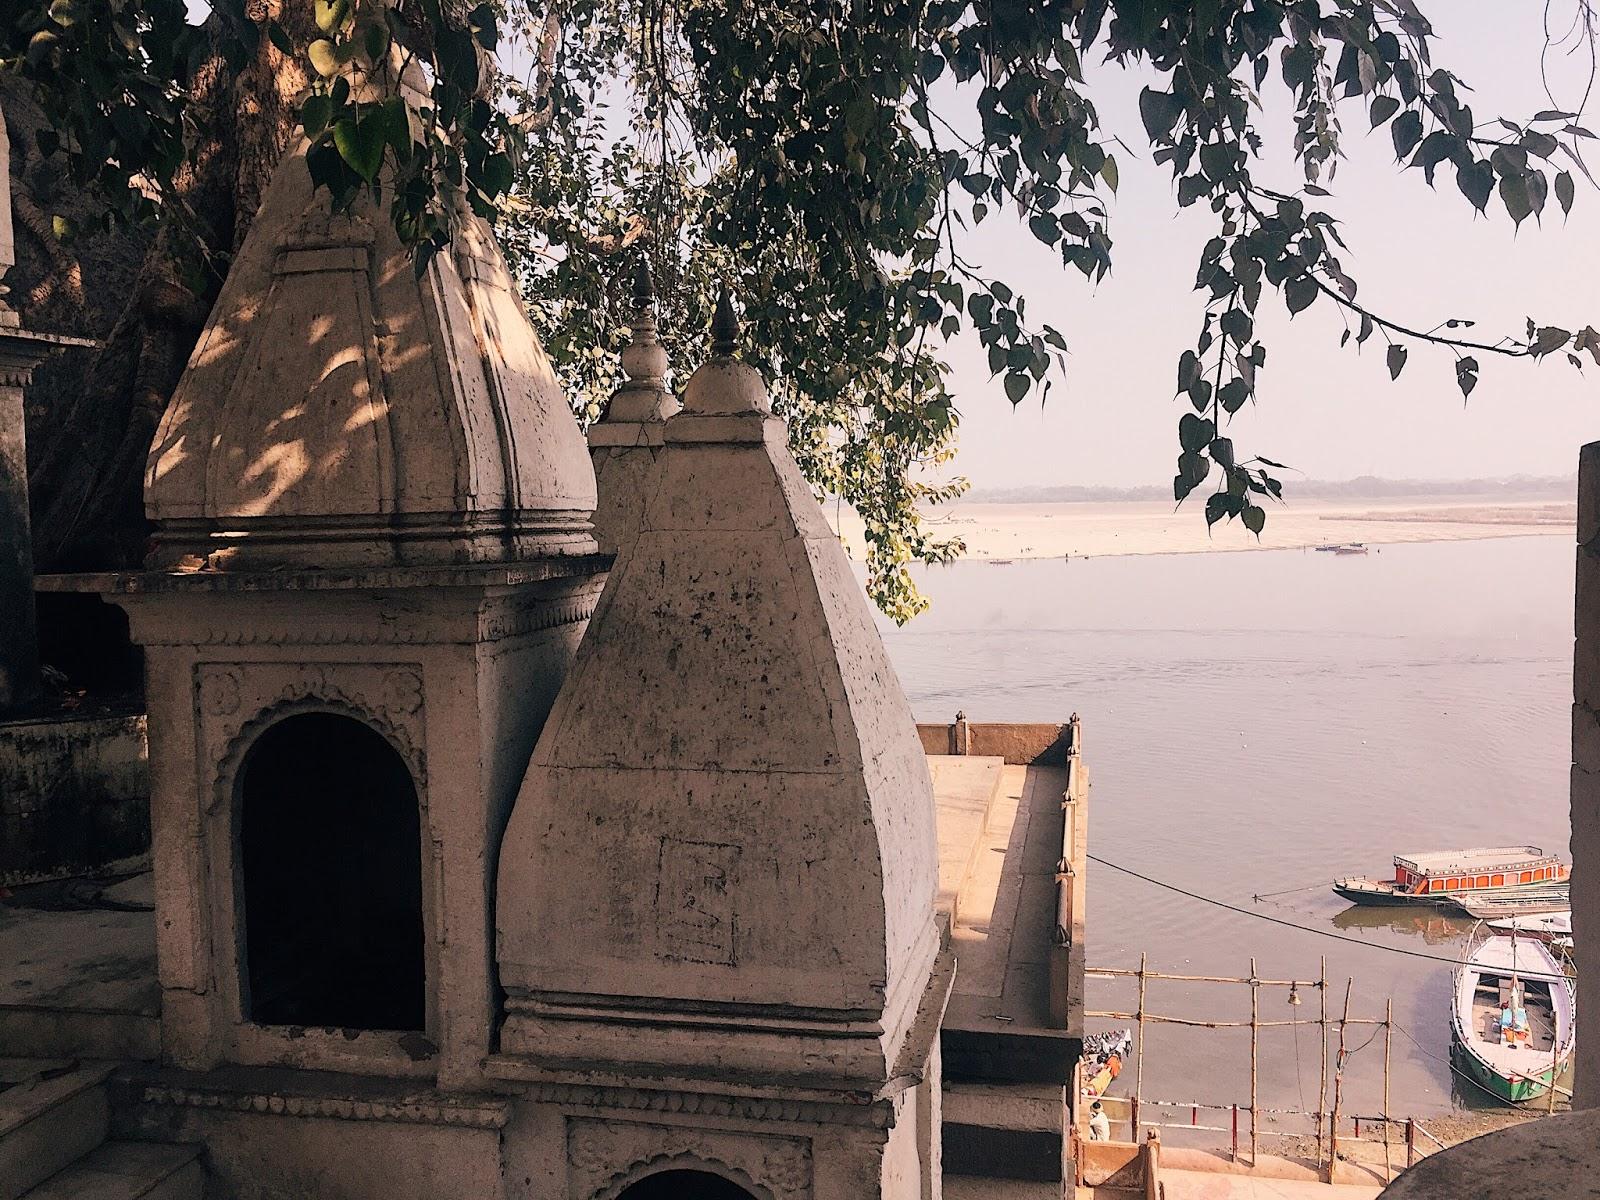 tulsi ghat,varanasi travel guide, vranasai information, tips on varanasi, travel varanasi, spiritual capital of india, city of temples, indian travel blogger, uk blog, benares travel